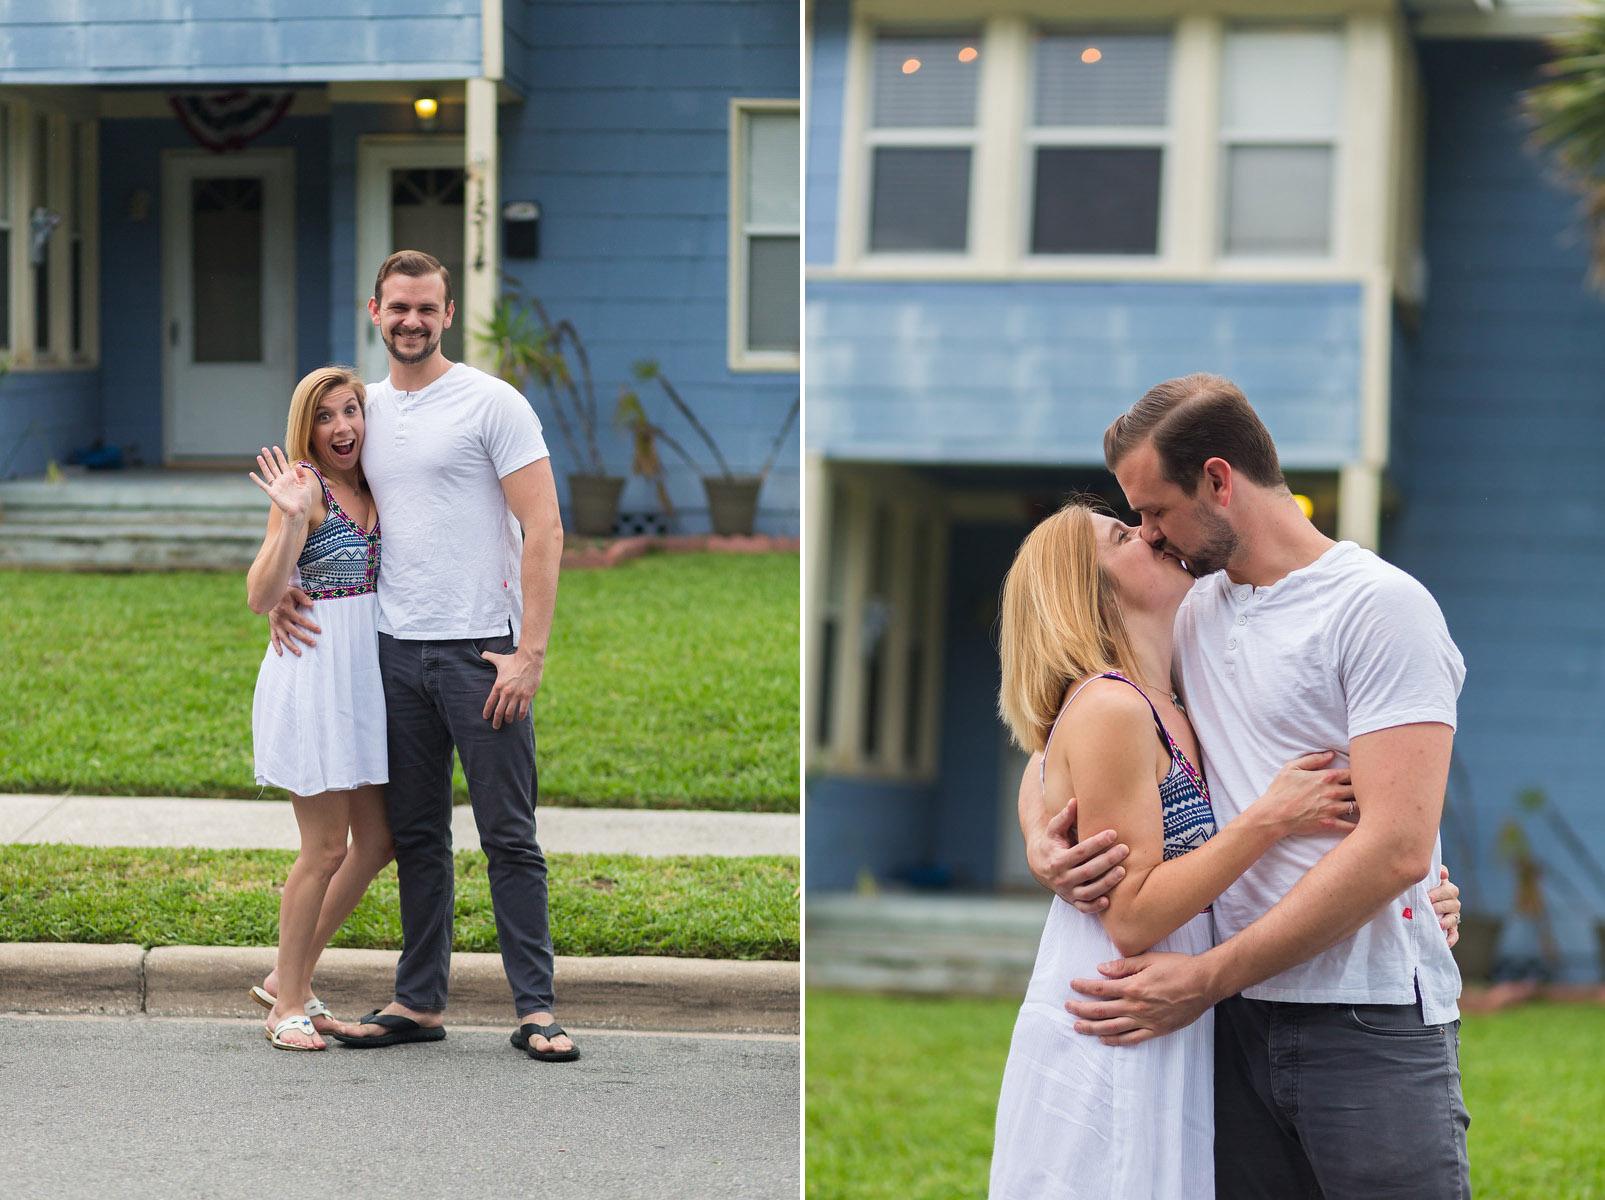 adam-szarmack-jacksonville-wedding-photographer-atlantic-beach-engagement-pictures-6.jpg